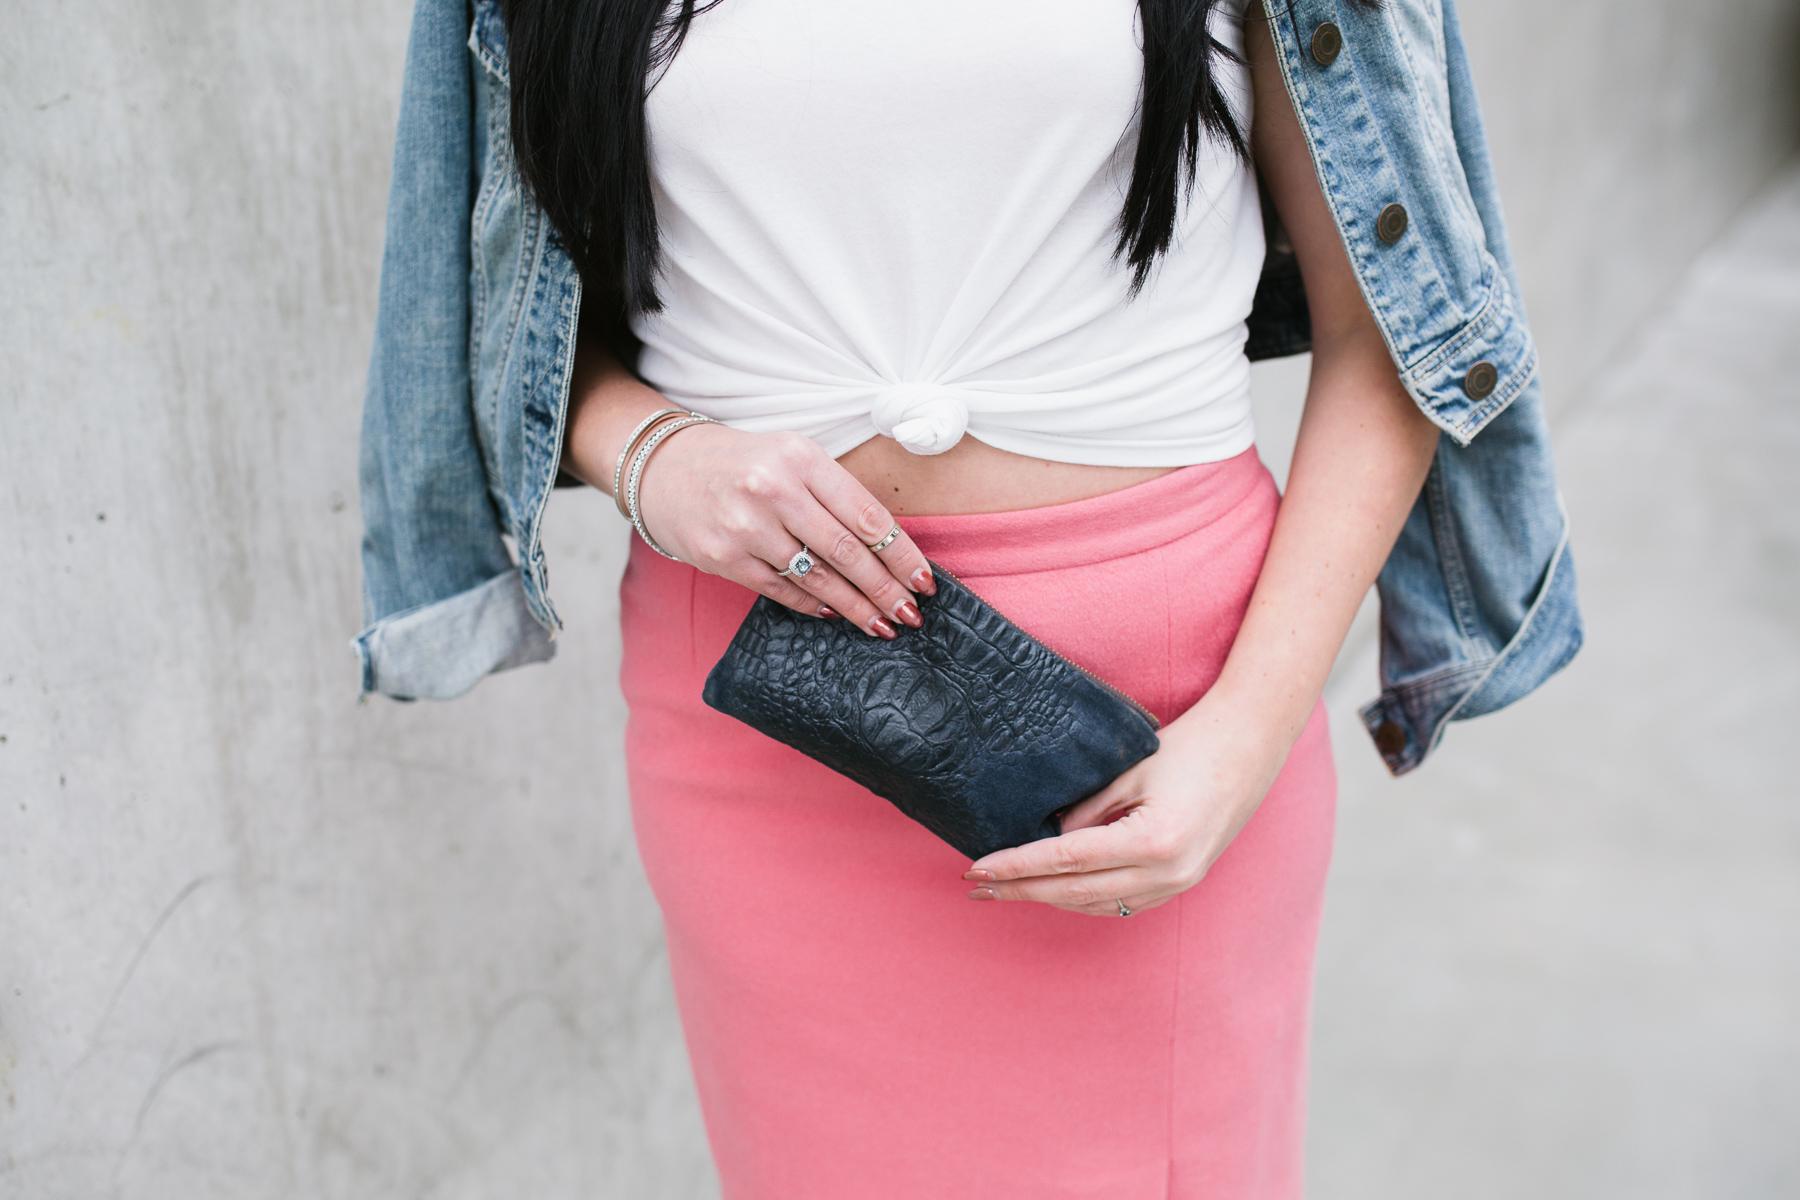 AN_PnP_Fashion-PinkskirtCasual010.jpg